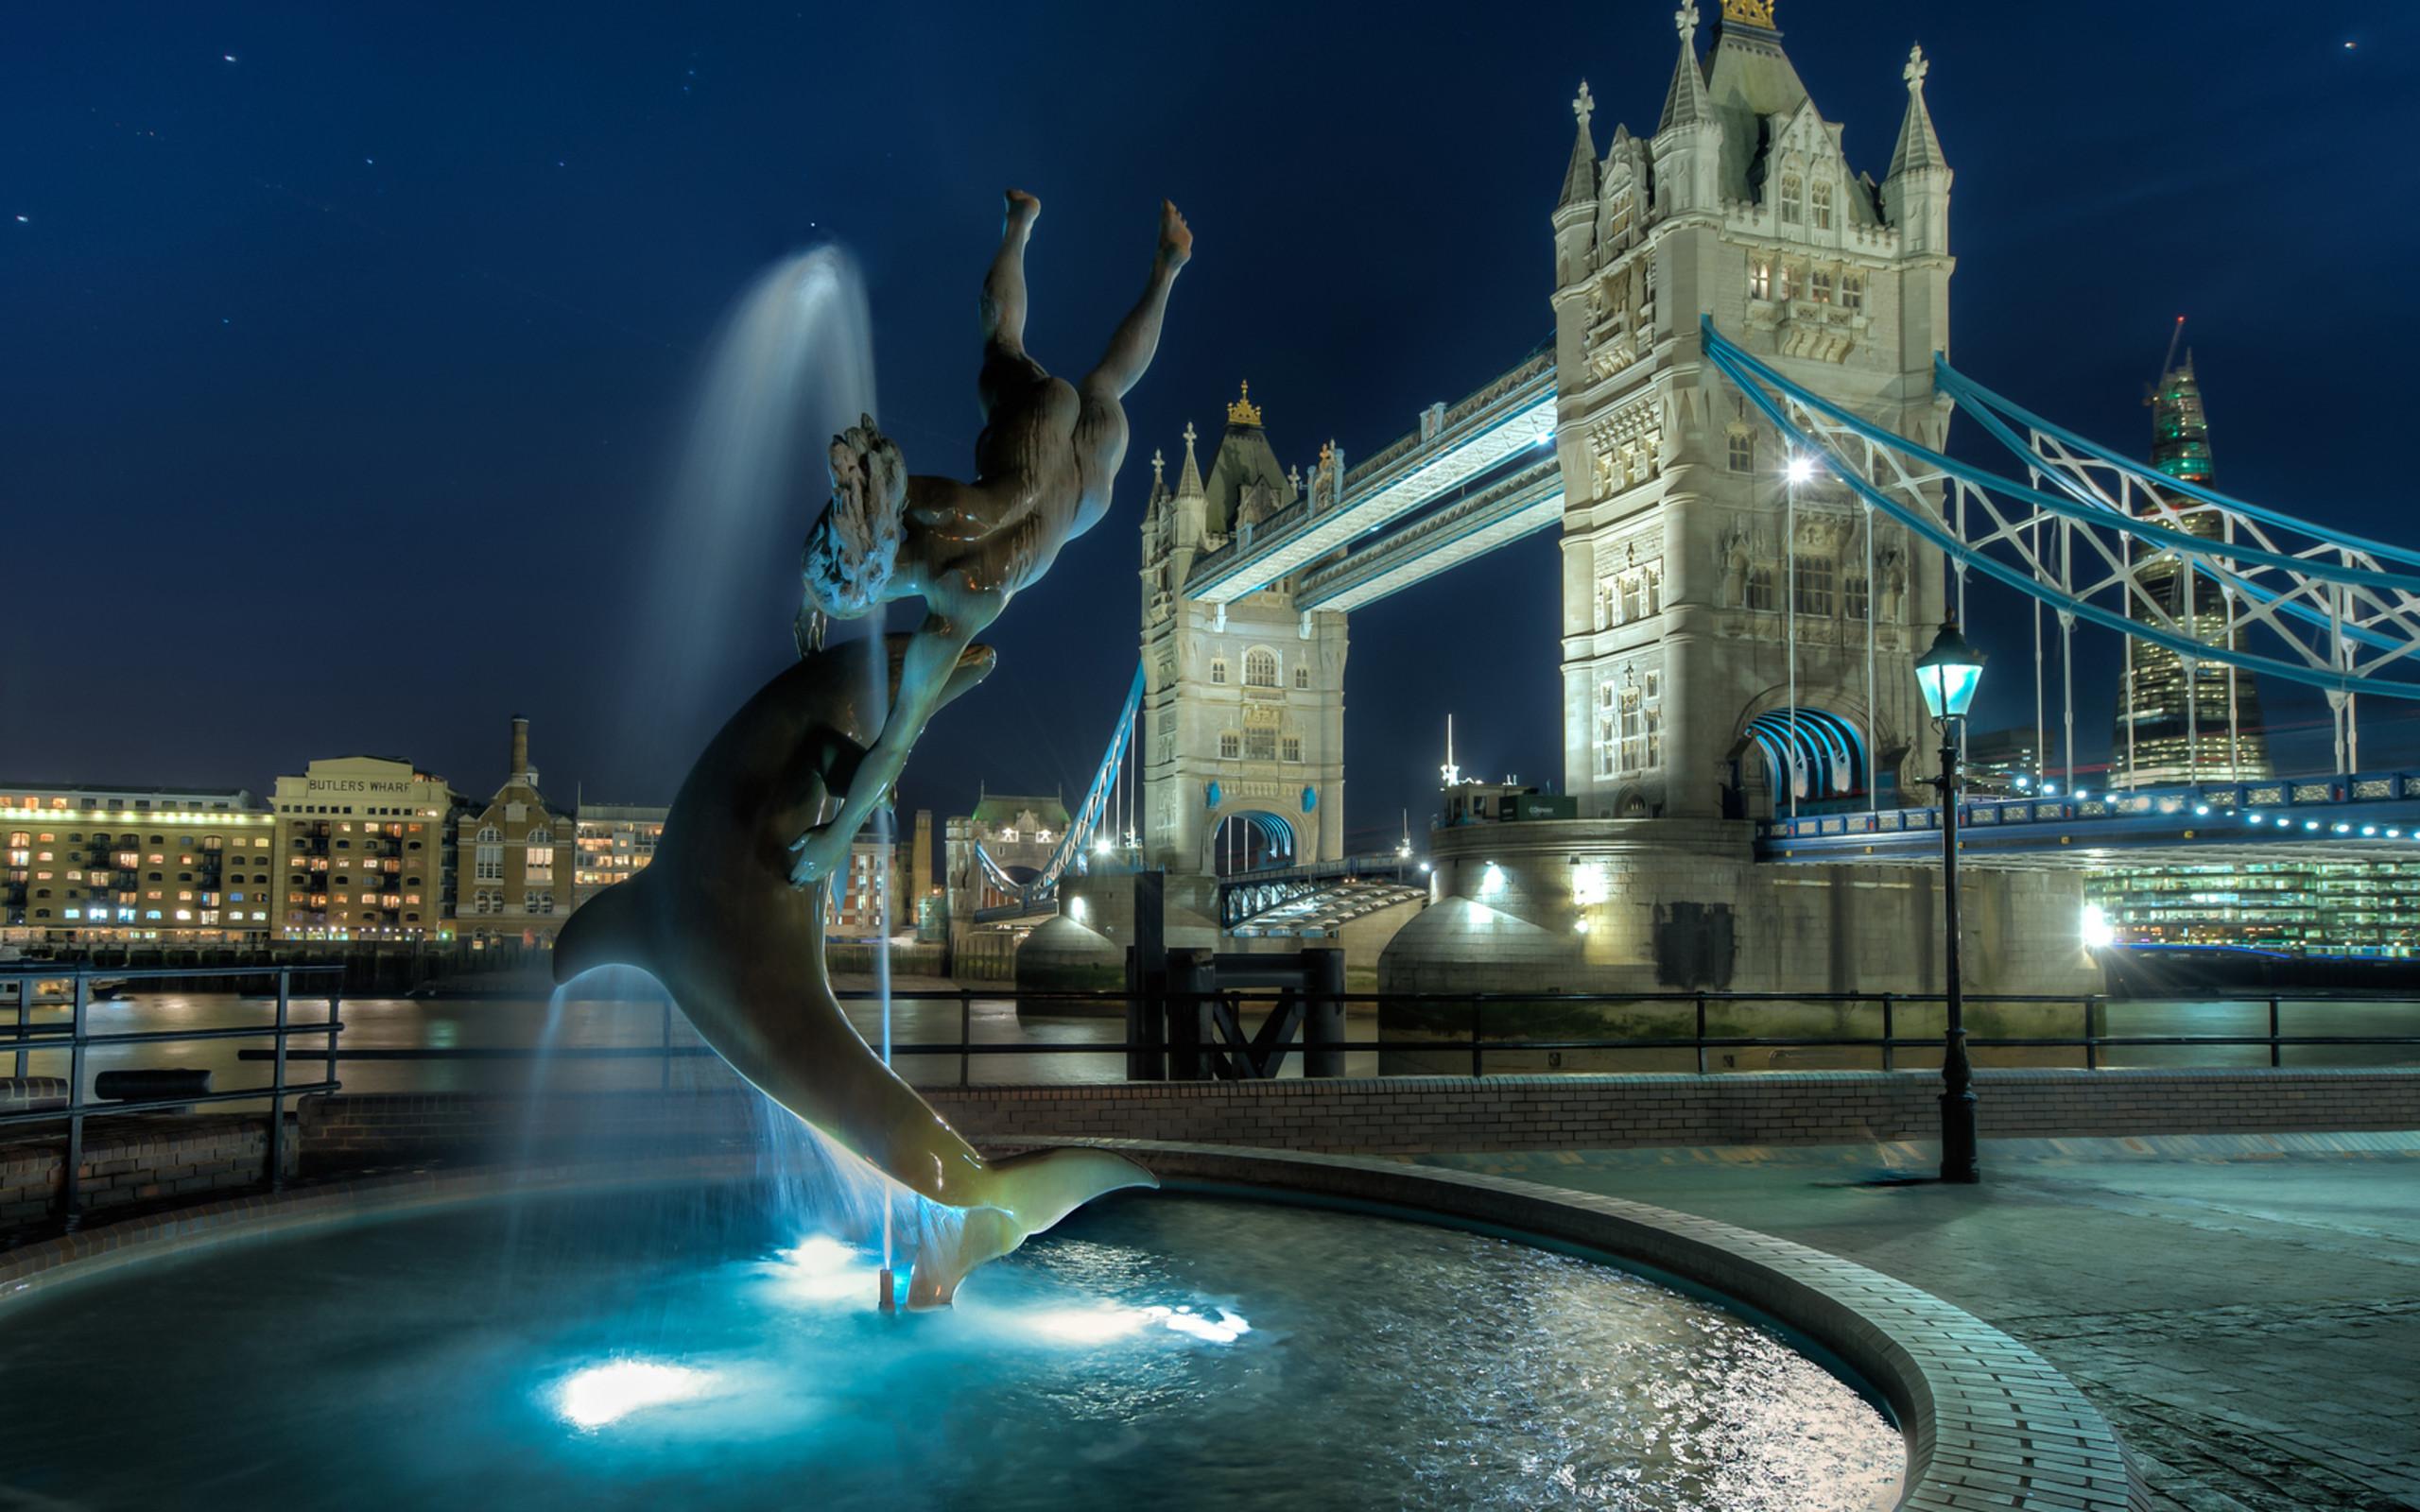 Res: 2560x1600, London Tower Bridge England